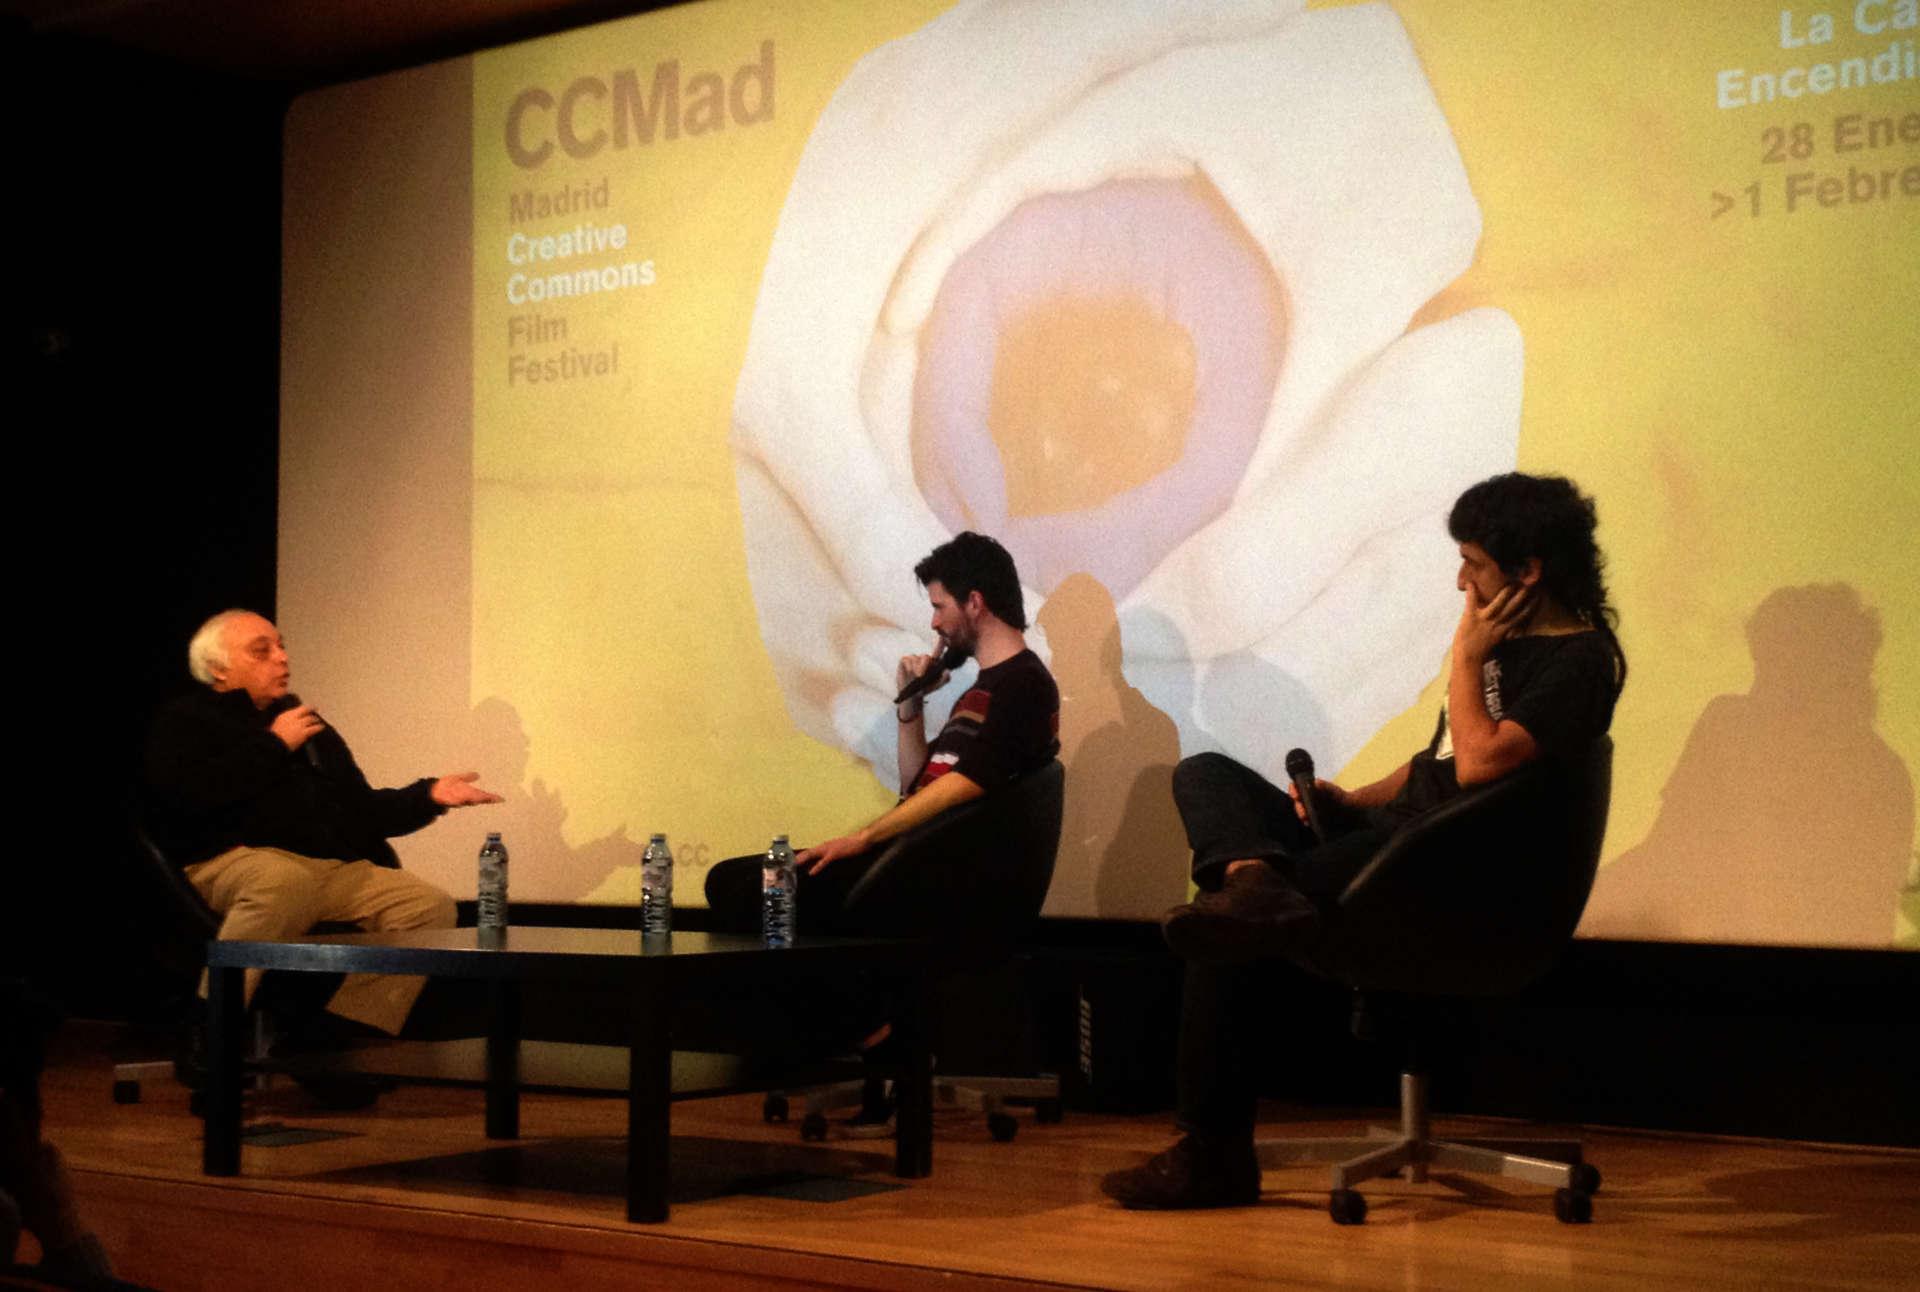 CCMad15_webseres 01-1